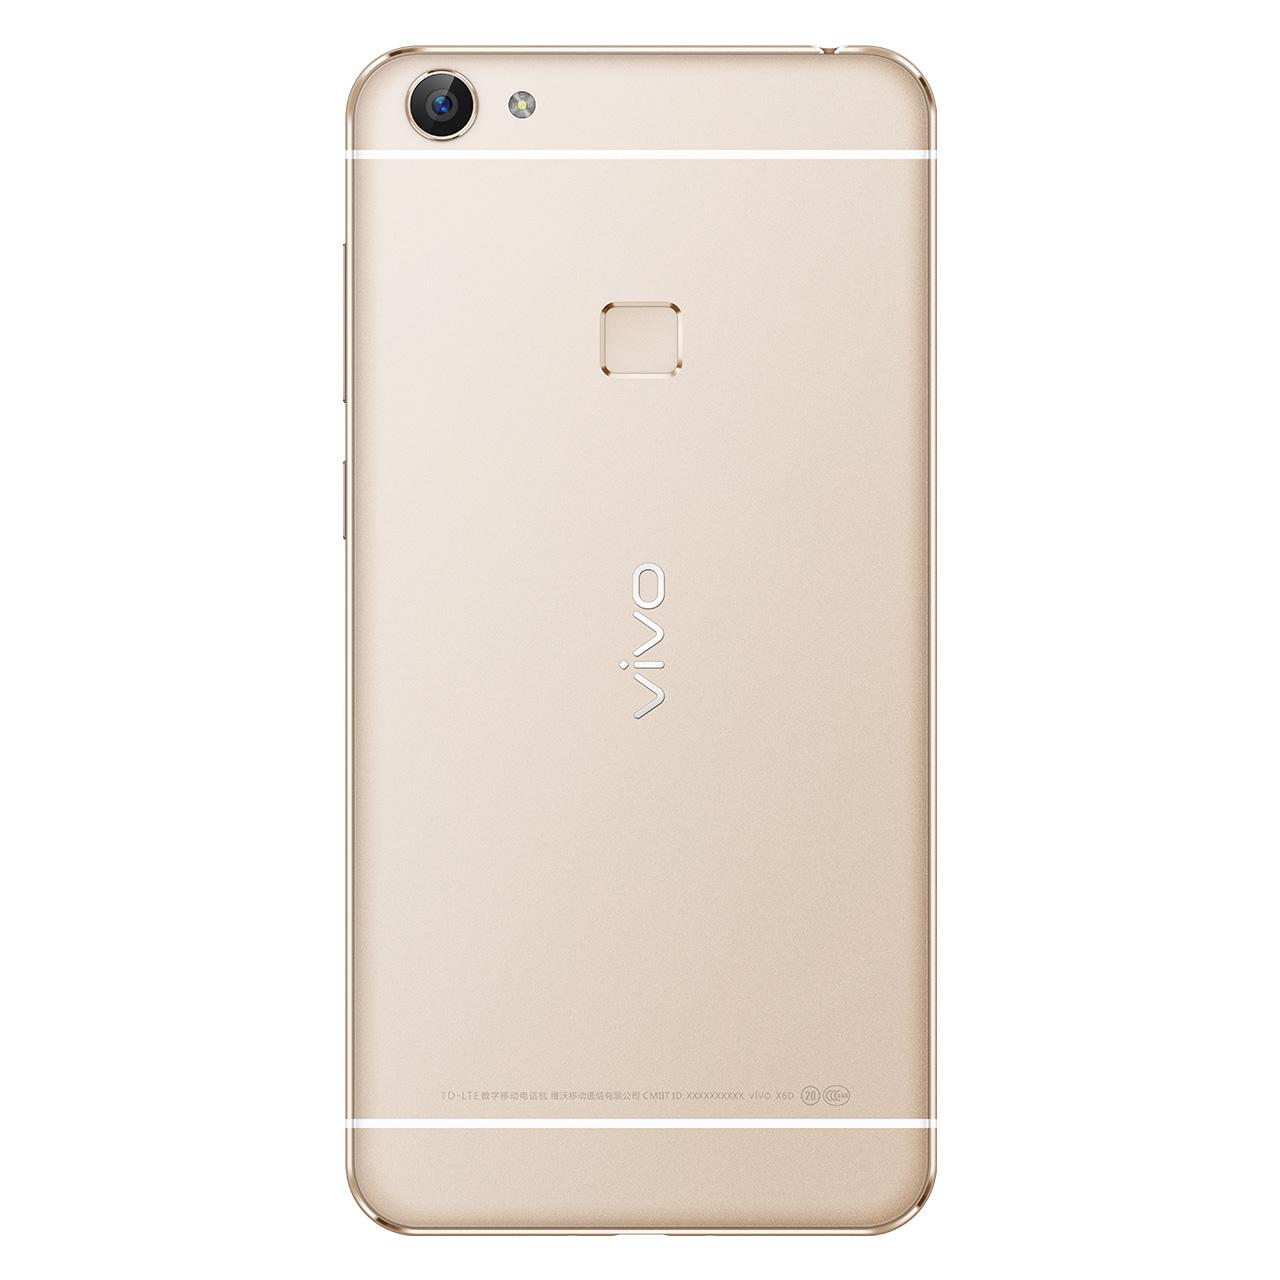 vivo-x6s-x6s-plus-launching-readme